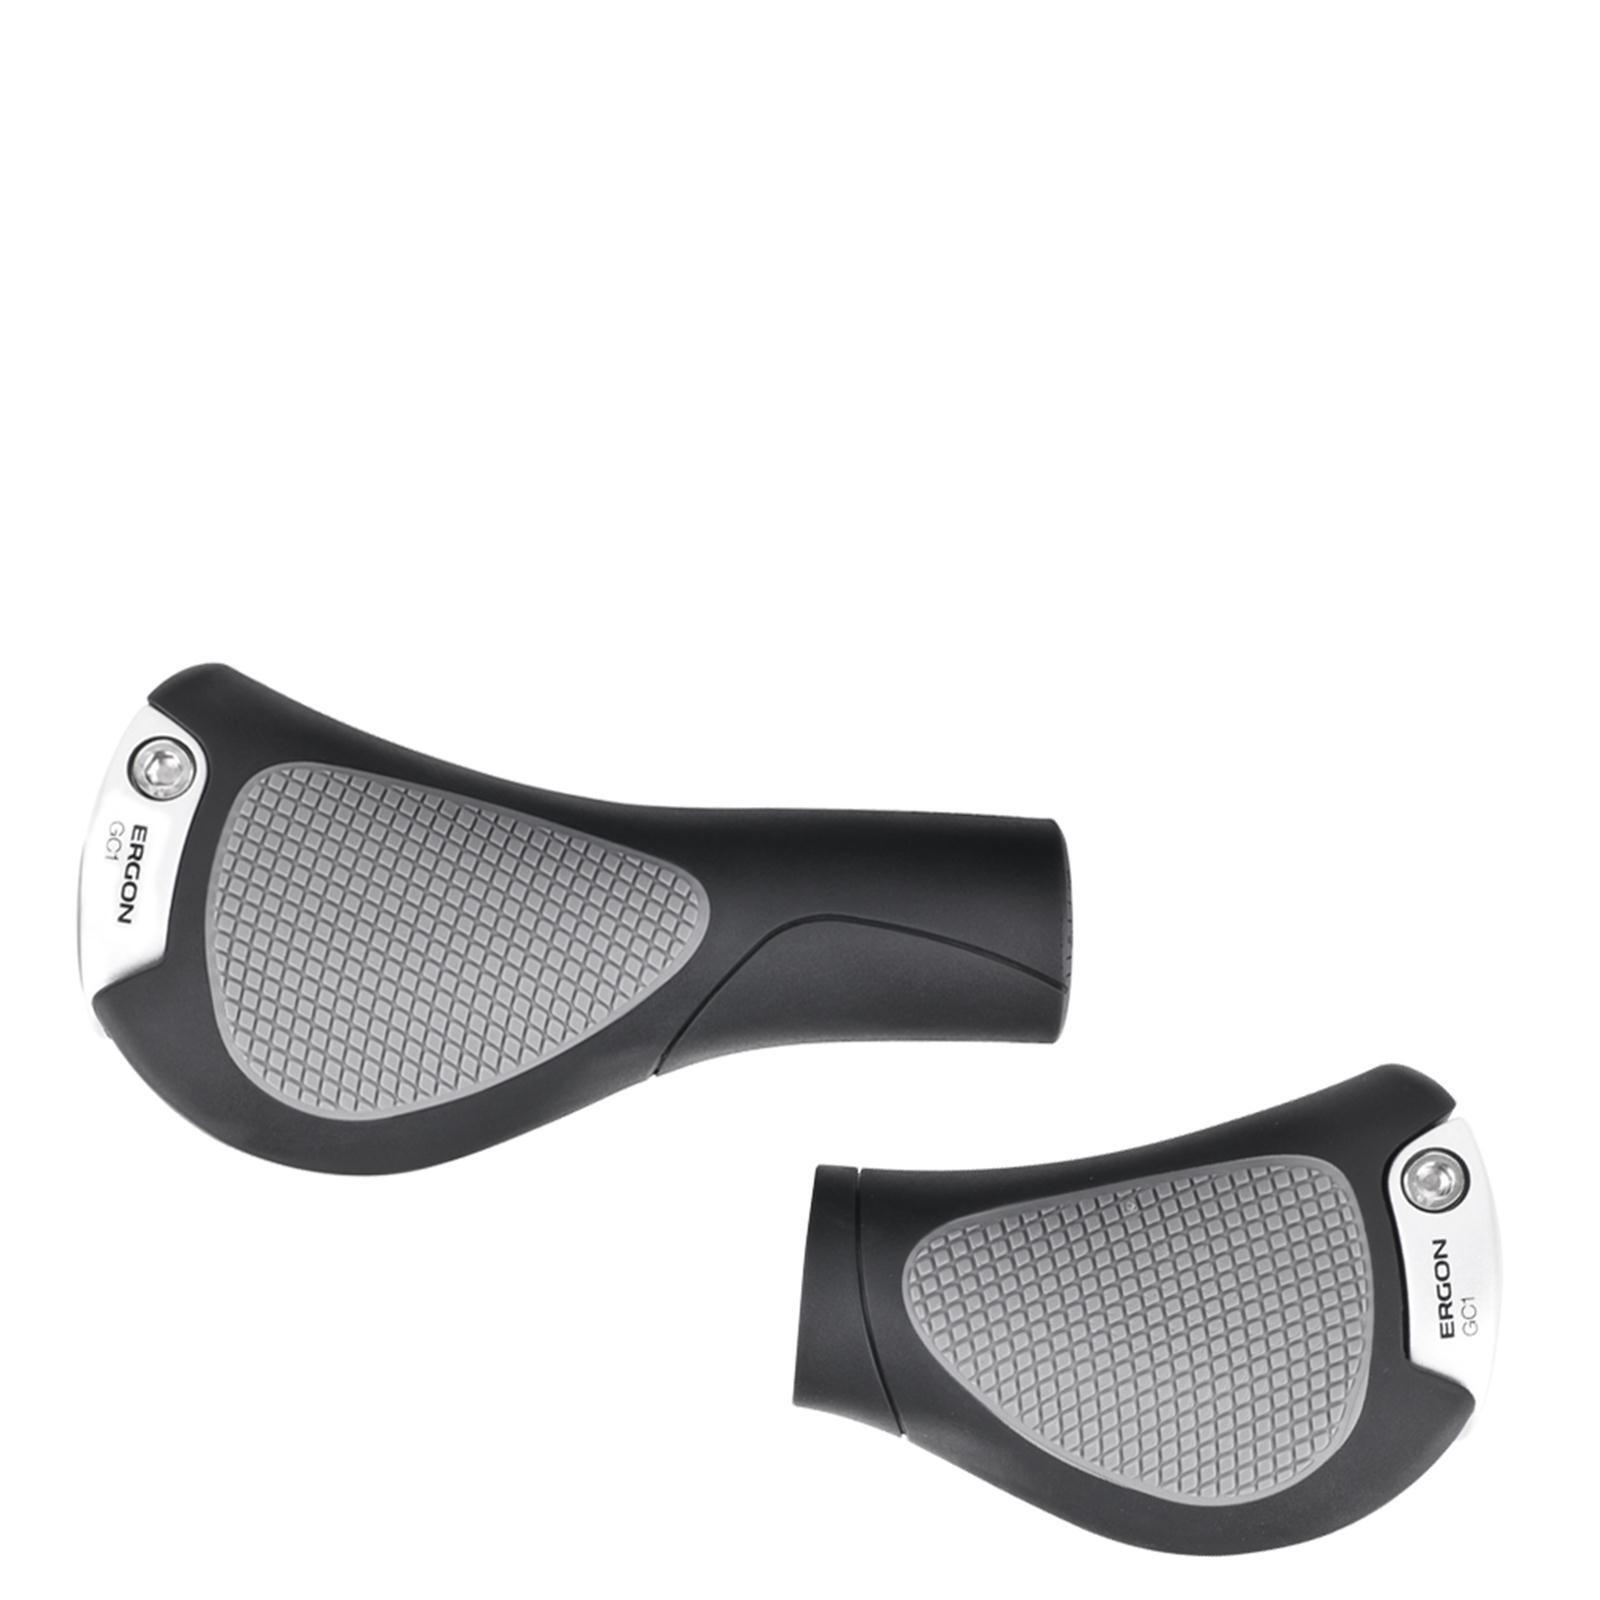 Ergon GC1 Fahrrad Griff Nexus    Rohloff Performance Comfort Series MTB City Rad  will make you satisfied